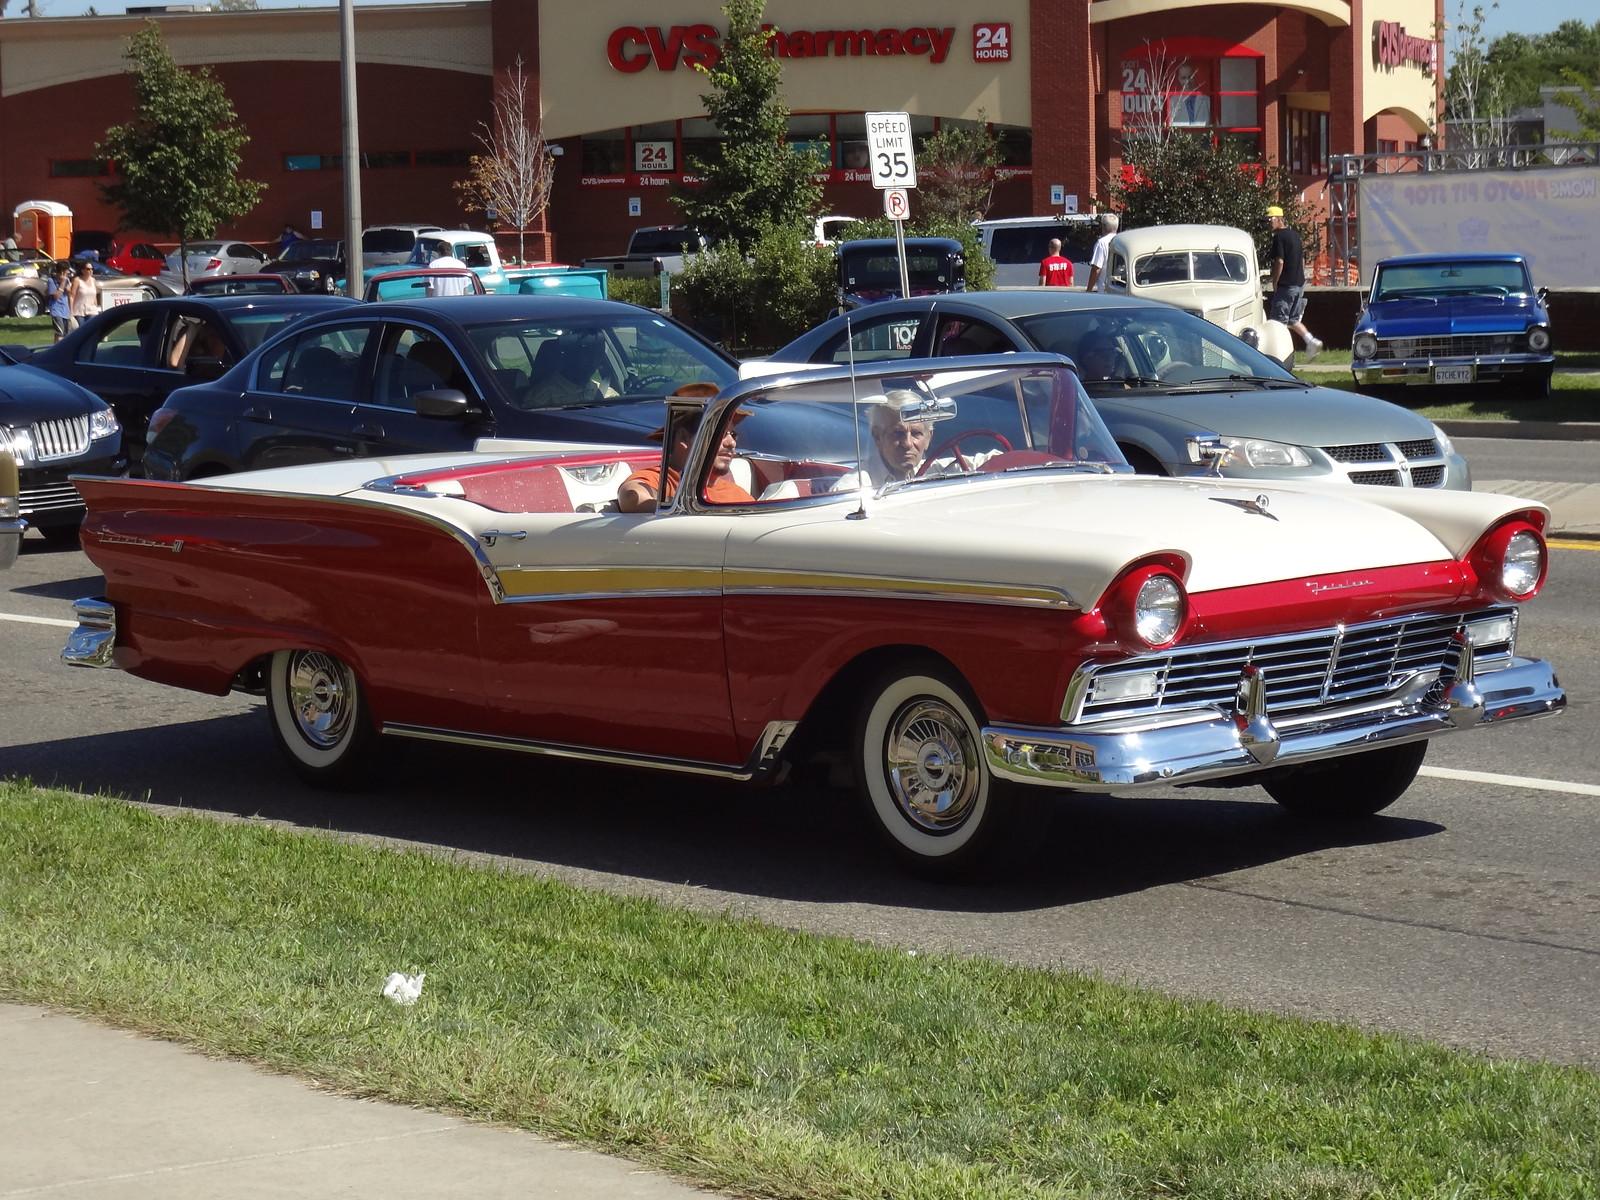 Diecast Car Forums Pics Woodward Dream Cruise Part 4